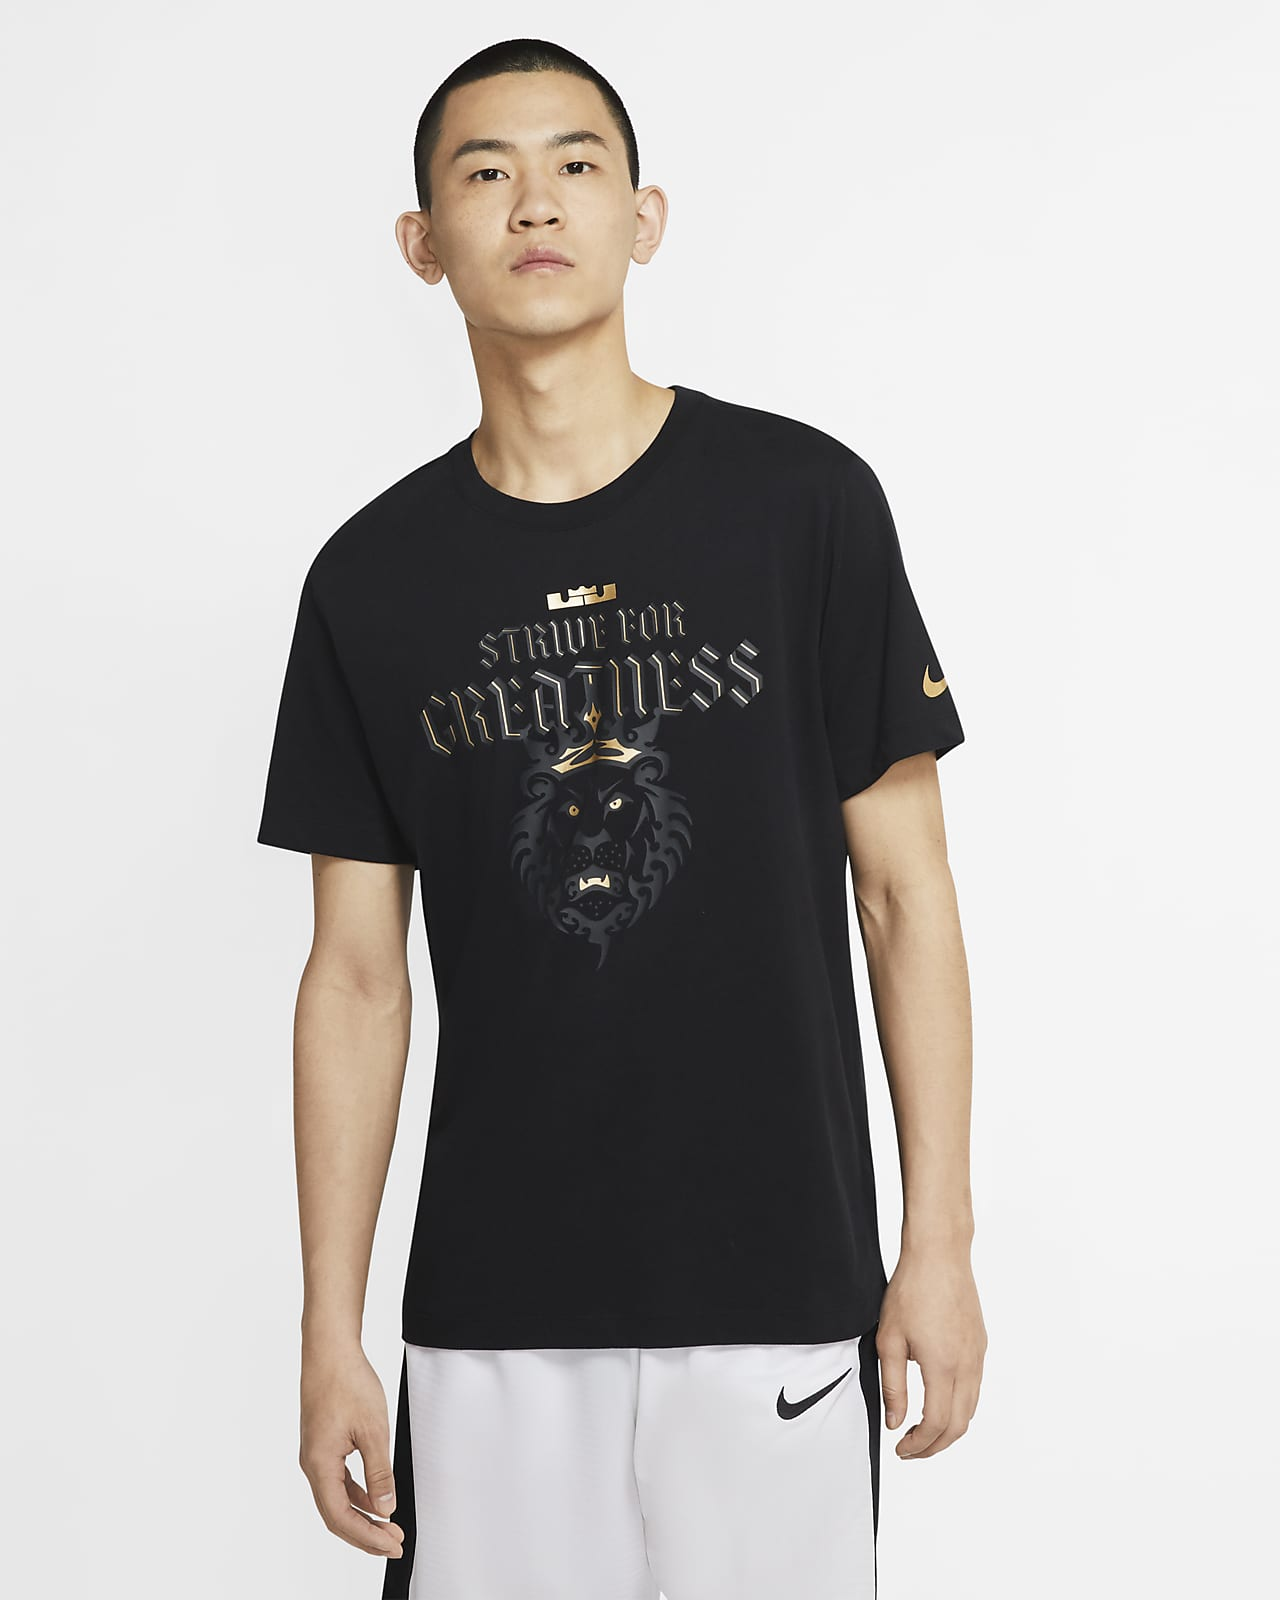 Nike Dri-FIT LeBron Strive For Greatness 男子篮球T恤